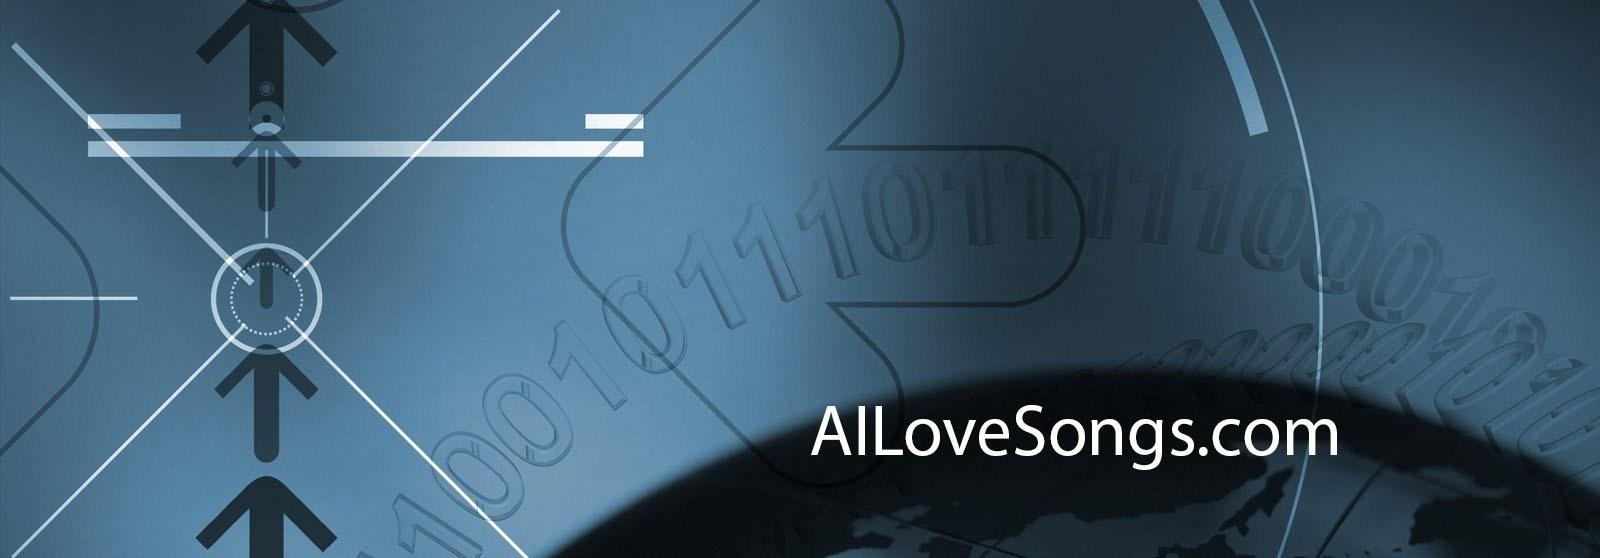 AI Love Songs by Zoe Keen AKA Shelby B. Craft of www.shelbycraft.com